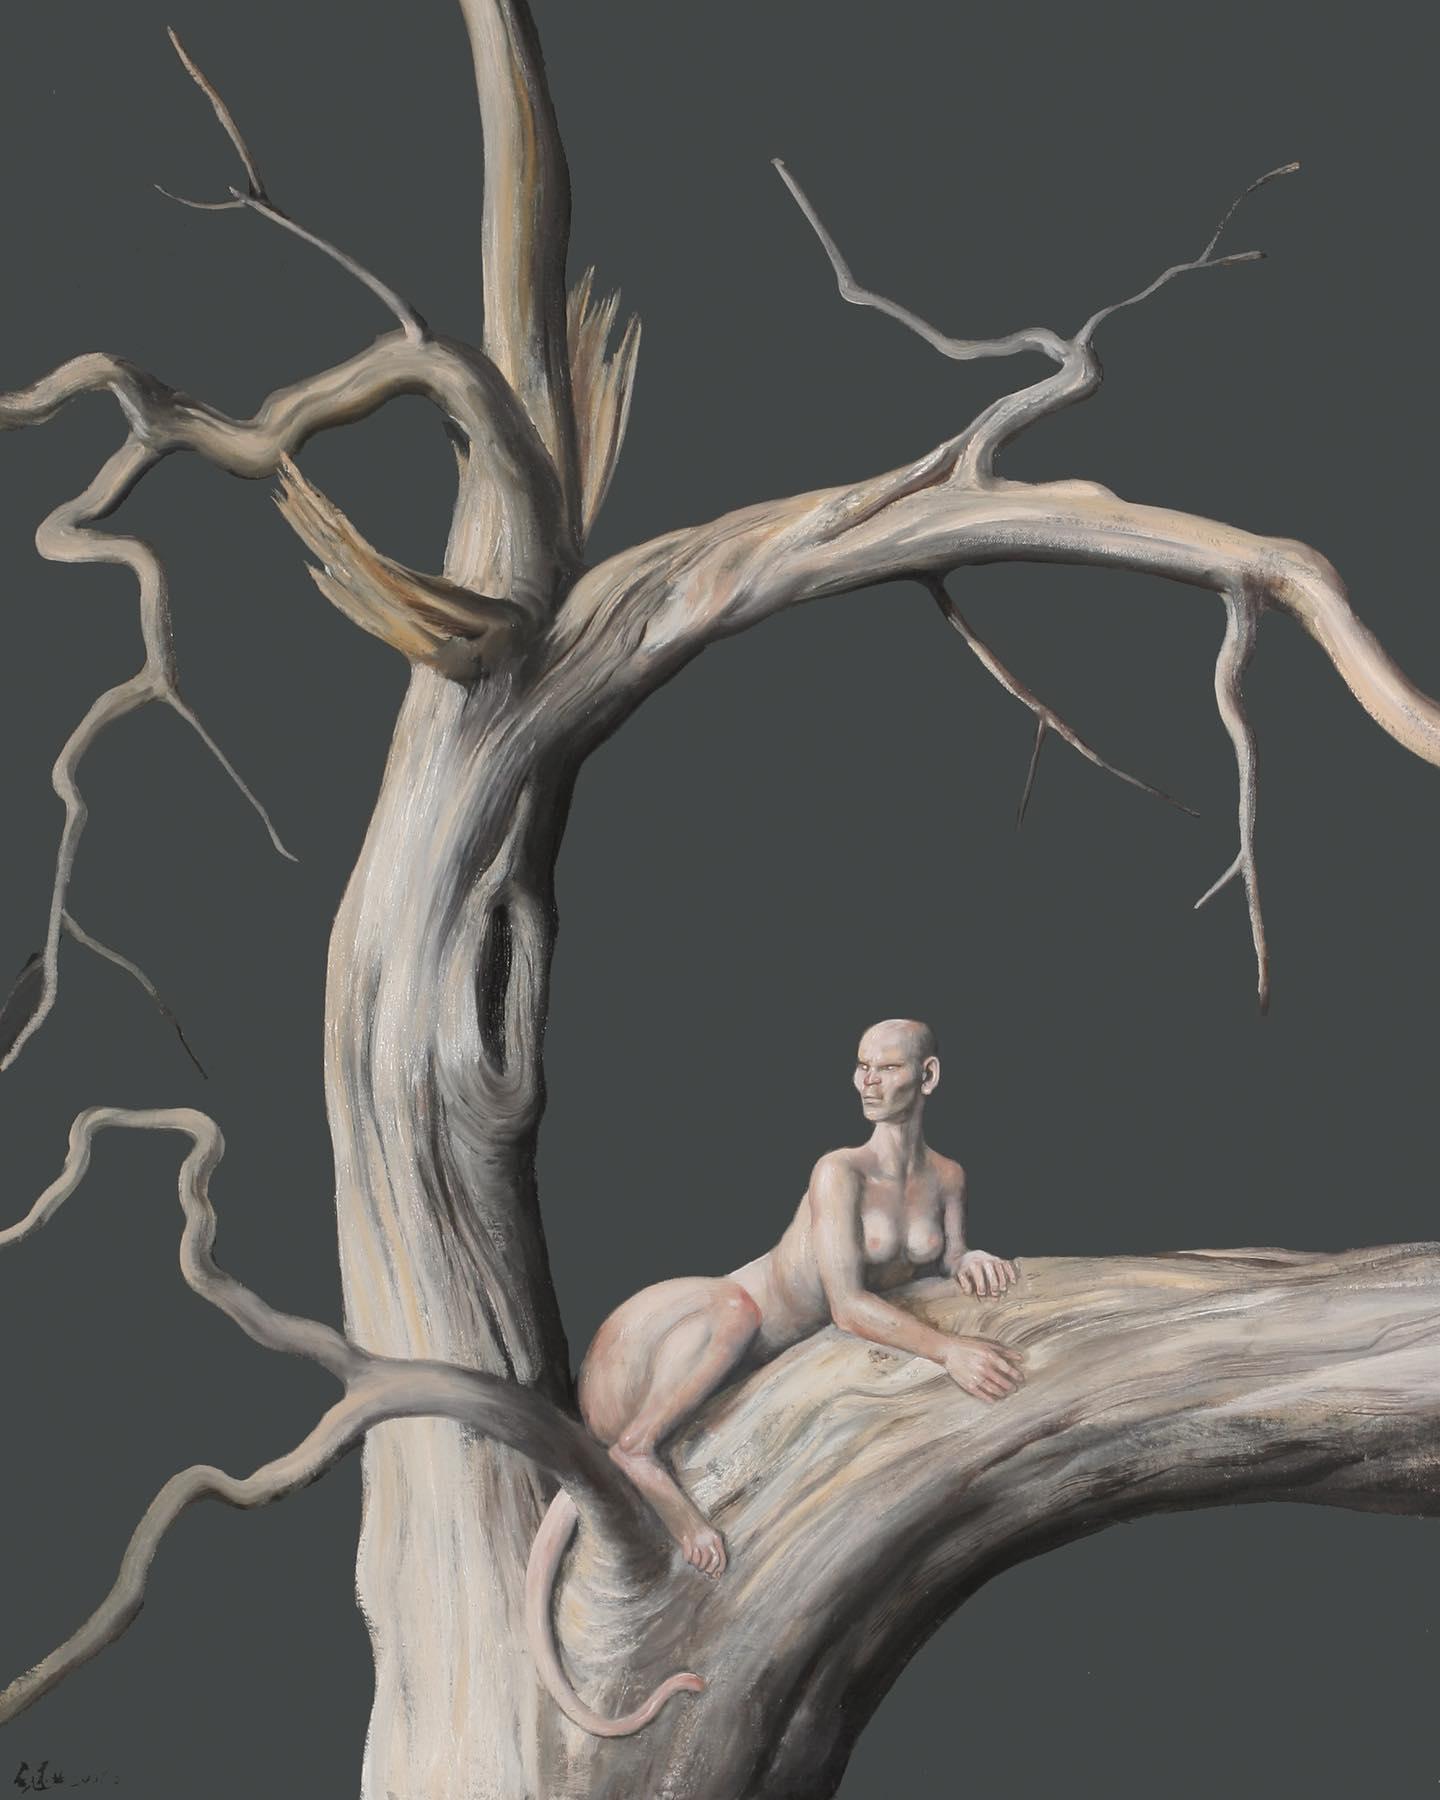 китайский художник Сюэ Цзие  (13).jpg